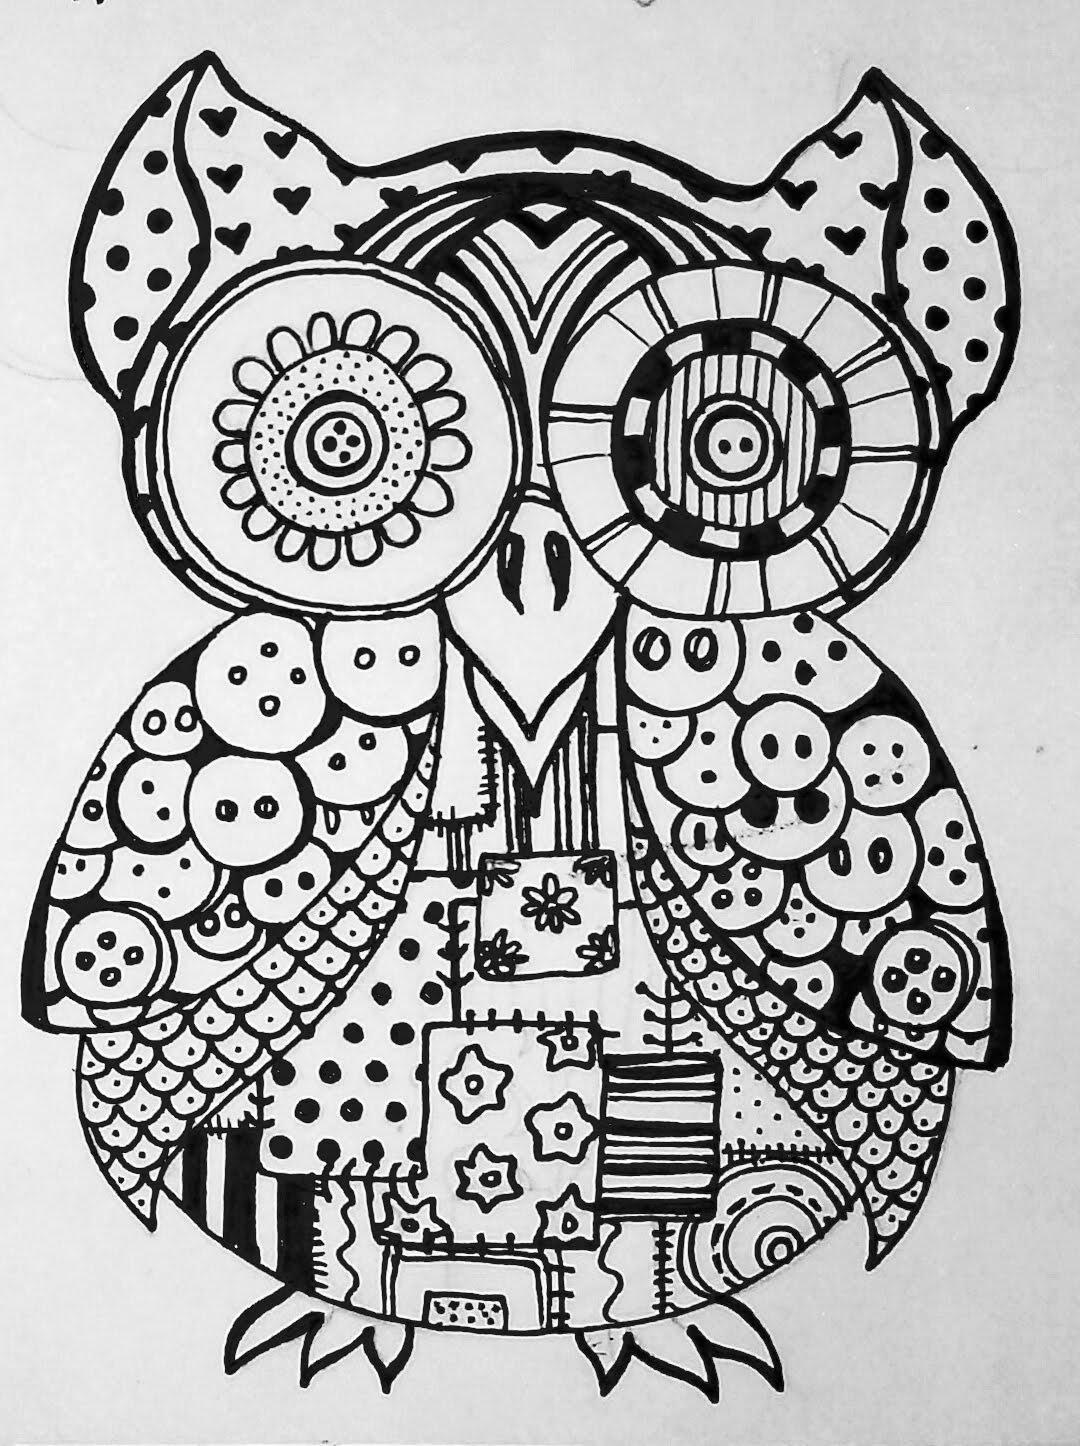 Owl Sugar Skull Coloring Page - photo#19